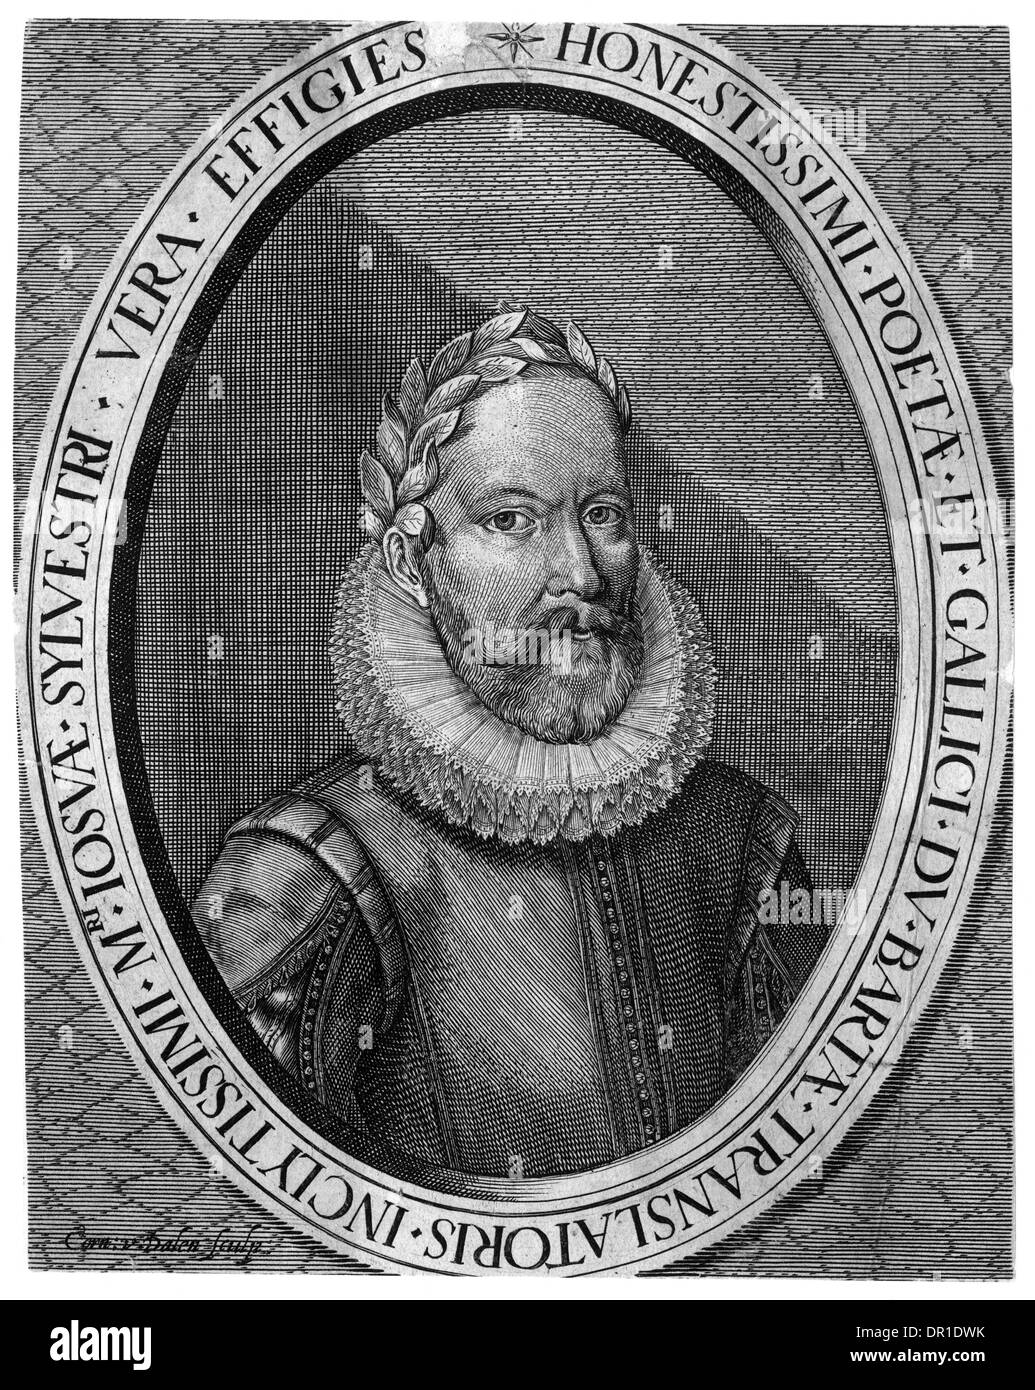 Joshua Sylvester merchant adventurers